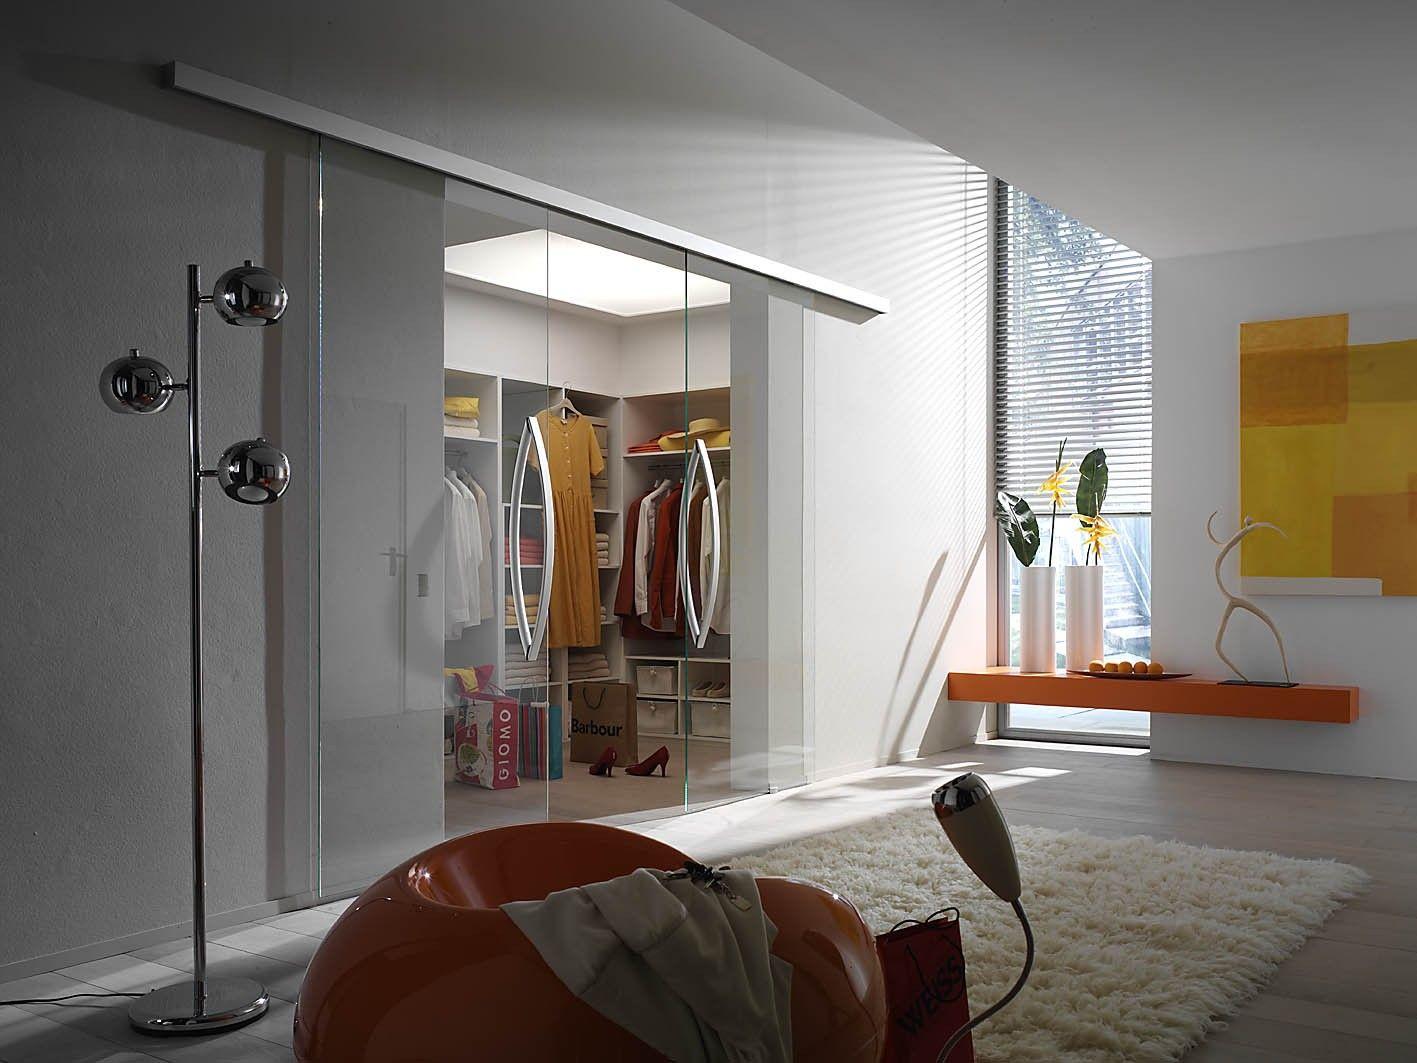 Clear Glass Room Divider - Sliding Door